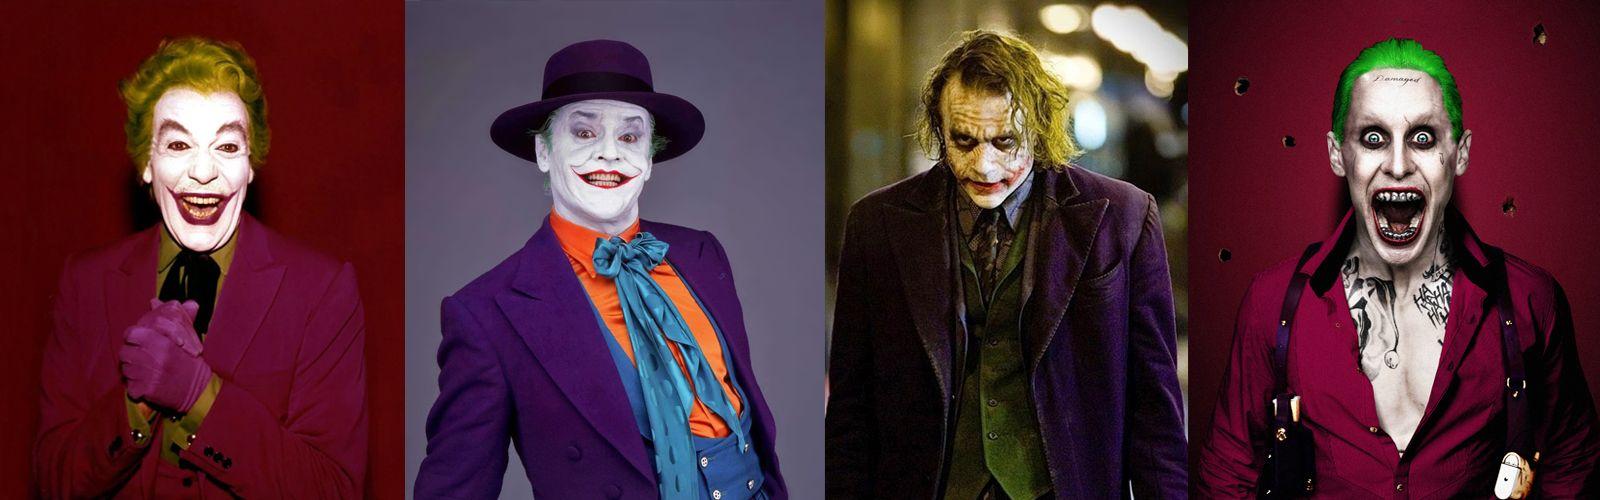 joker-actors-nicholson-leto-ledger-romero